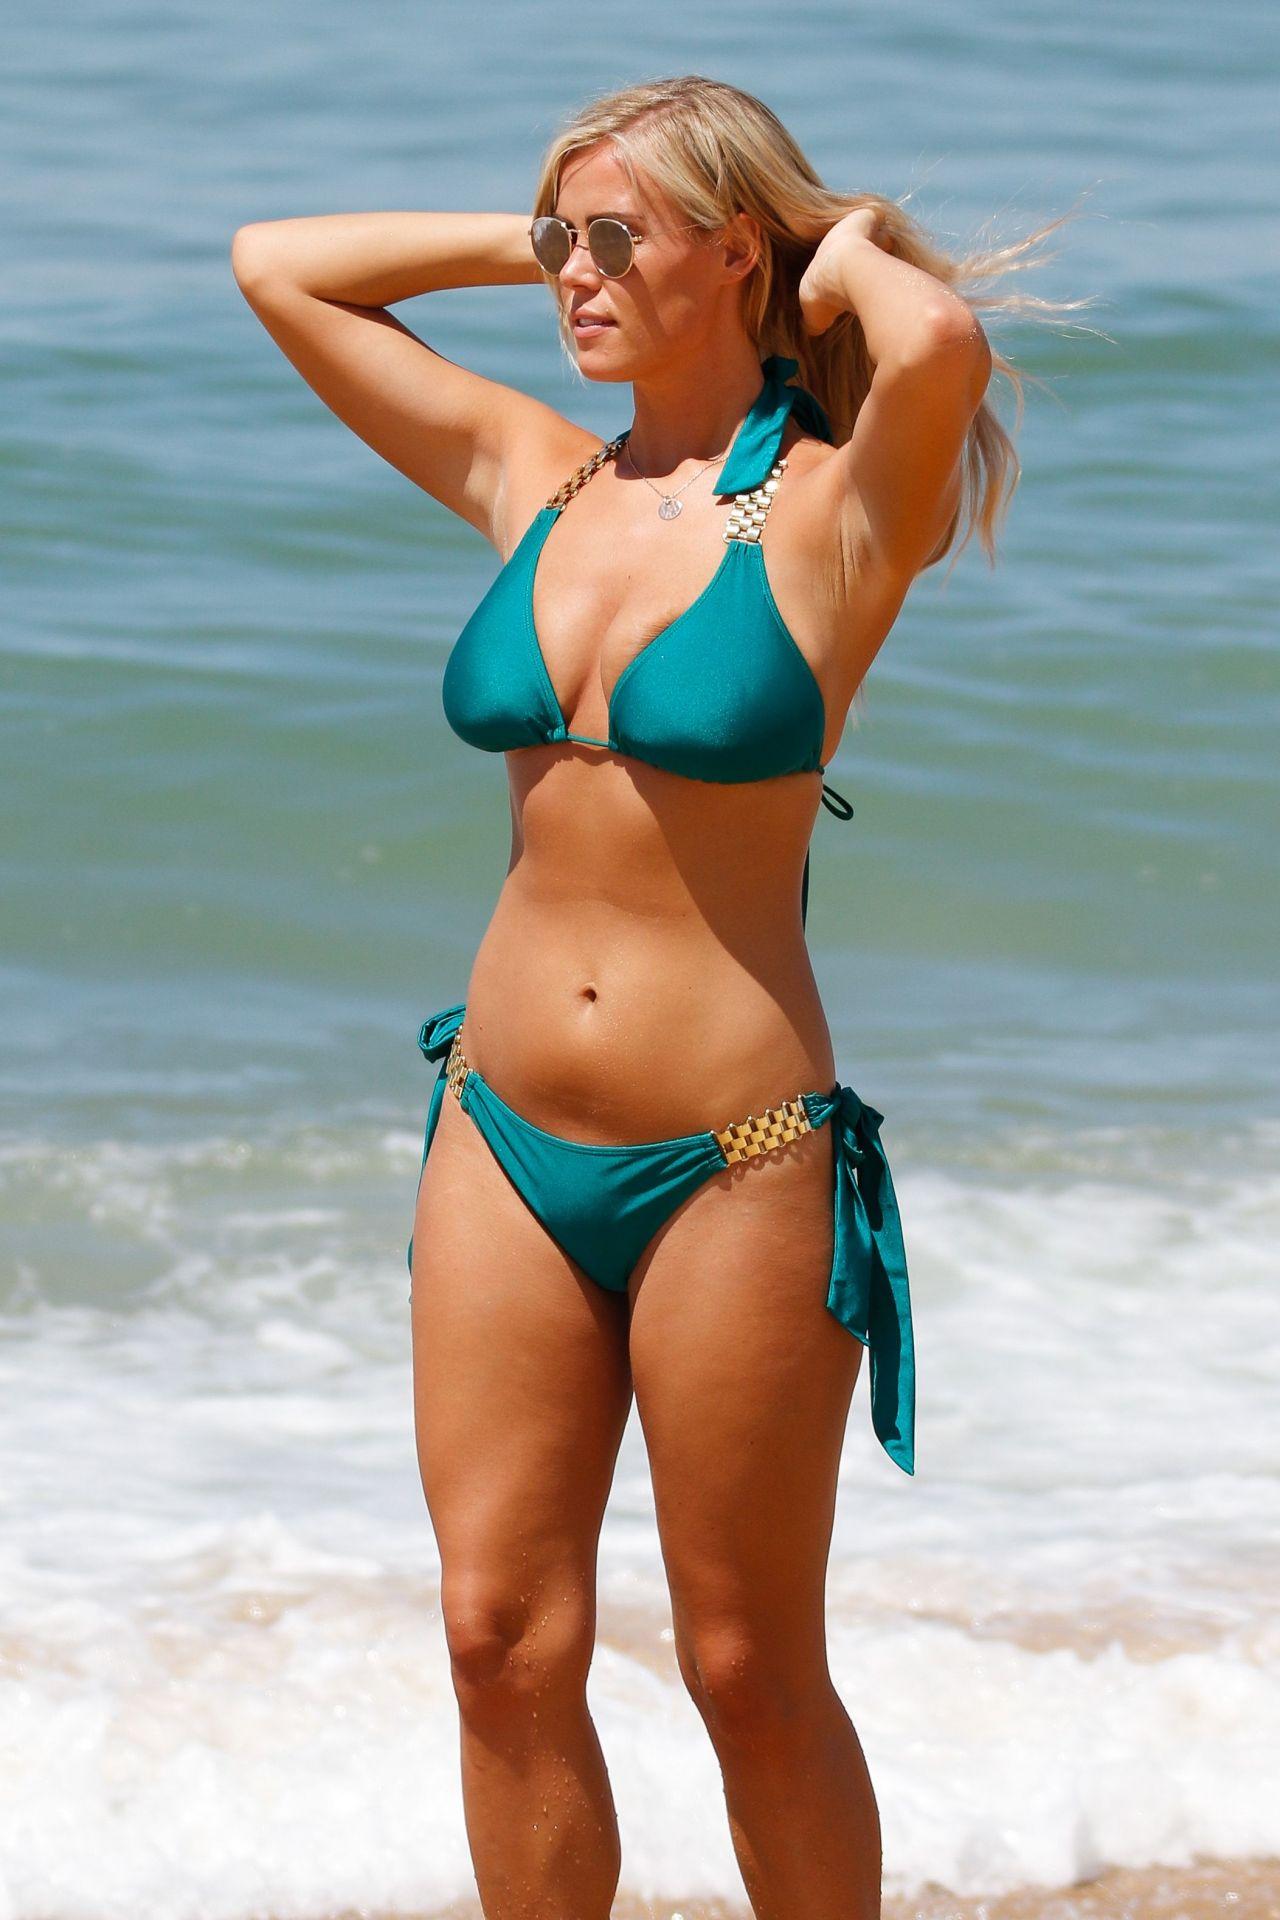 Chloe Meadows In A Green Bikini On A Beach In Portugal -7157